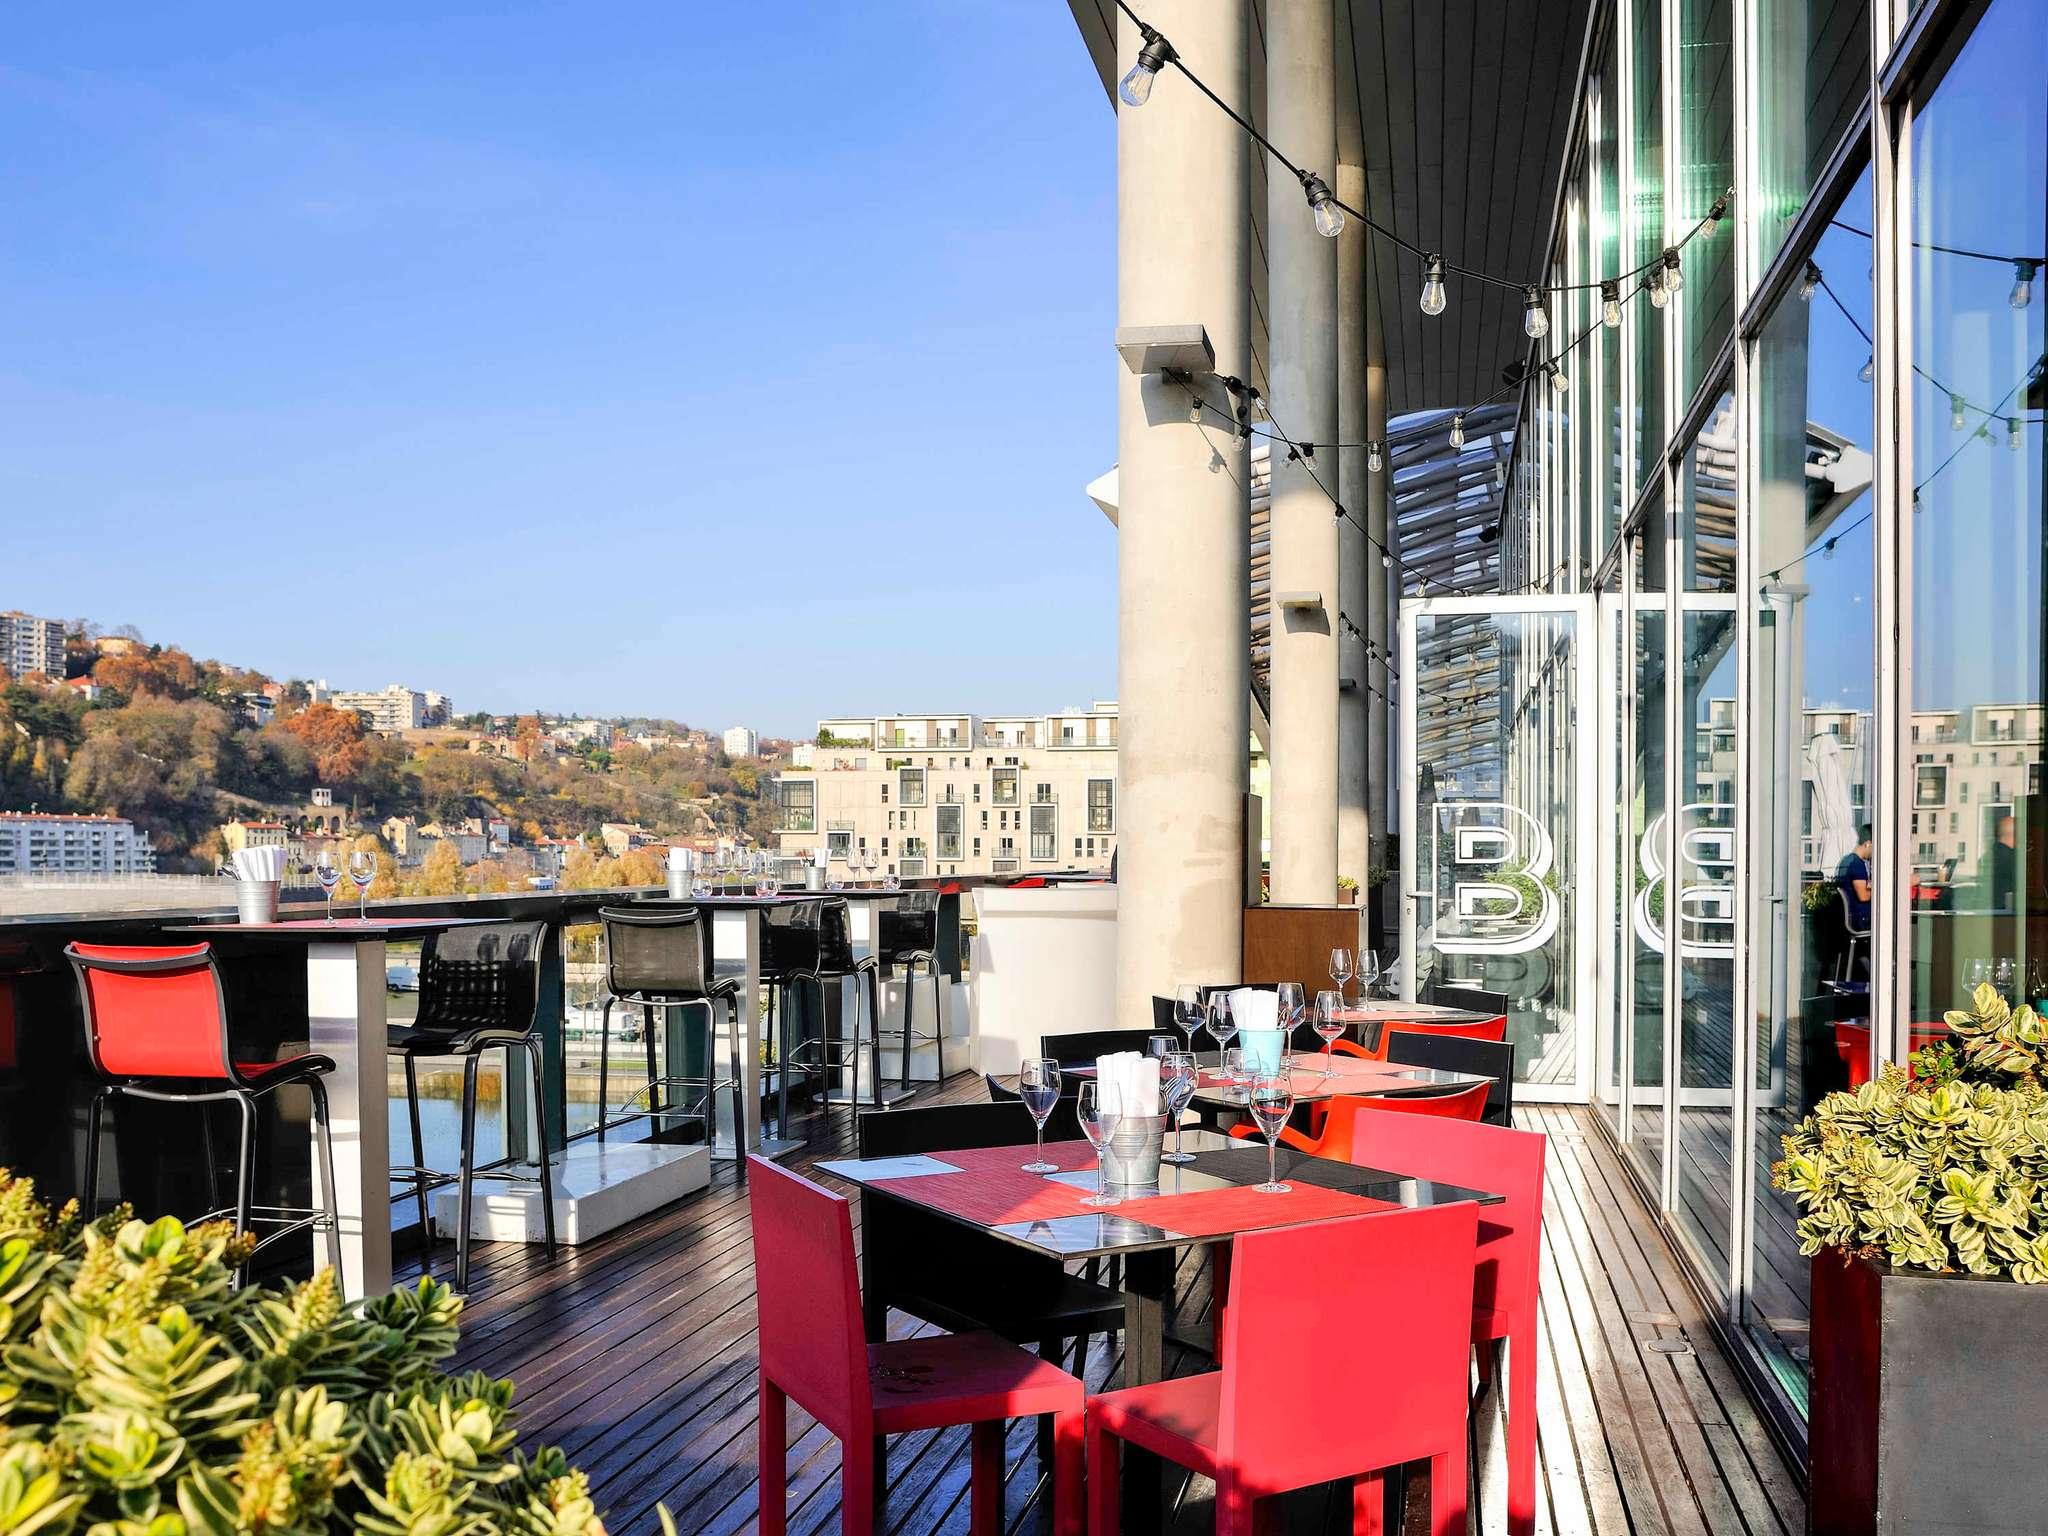 Hotell – Novotel Lyon Confluence